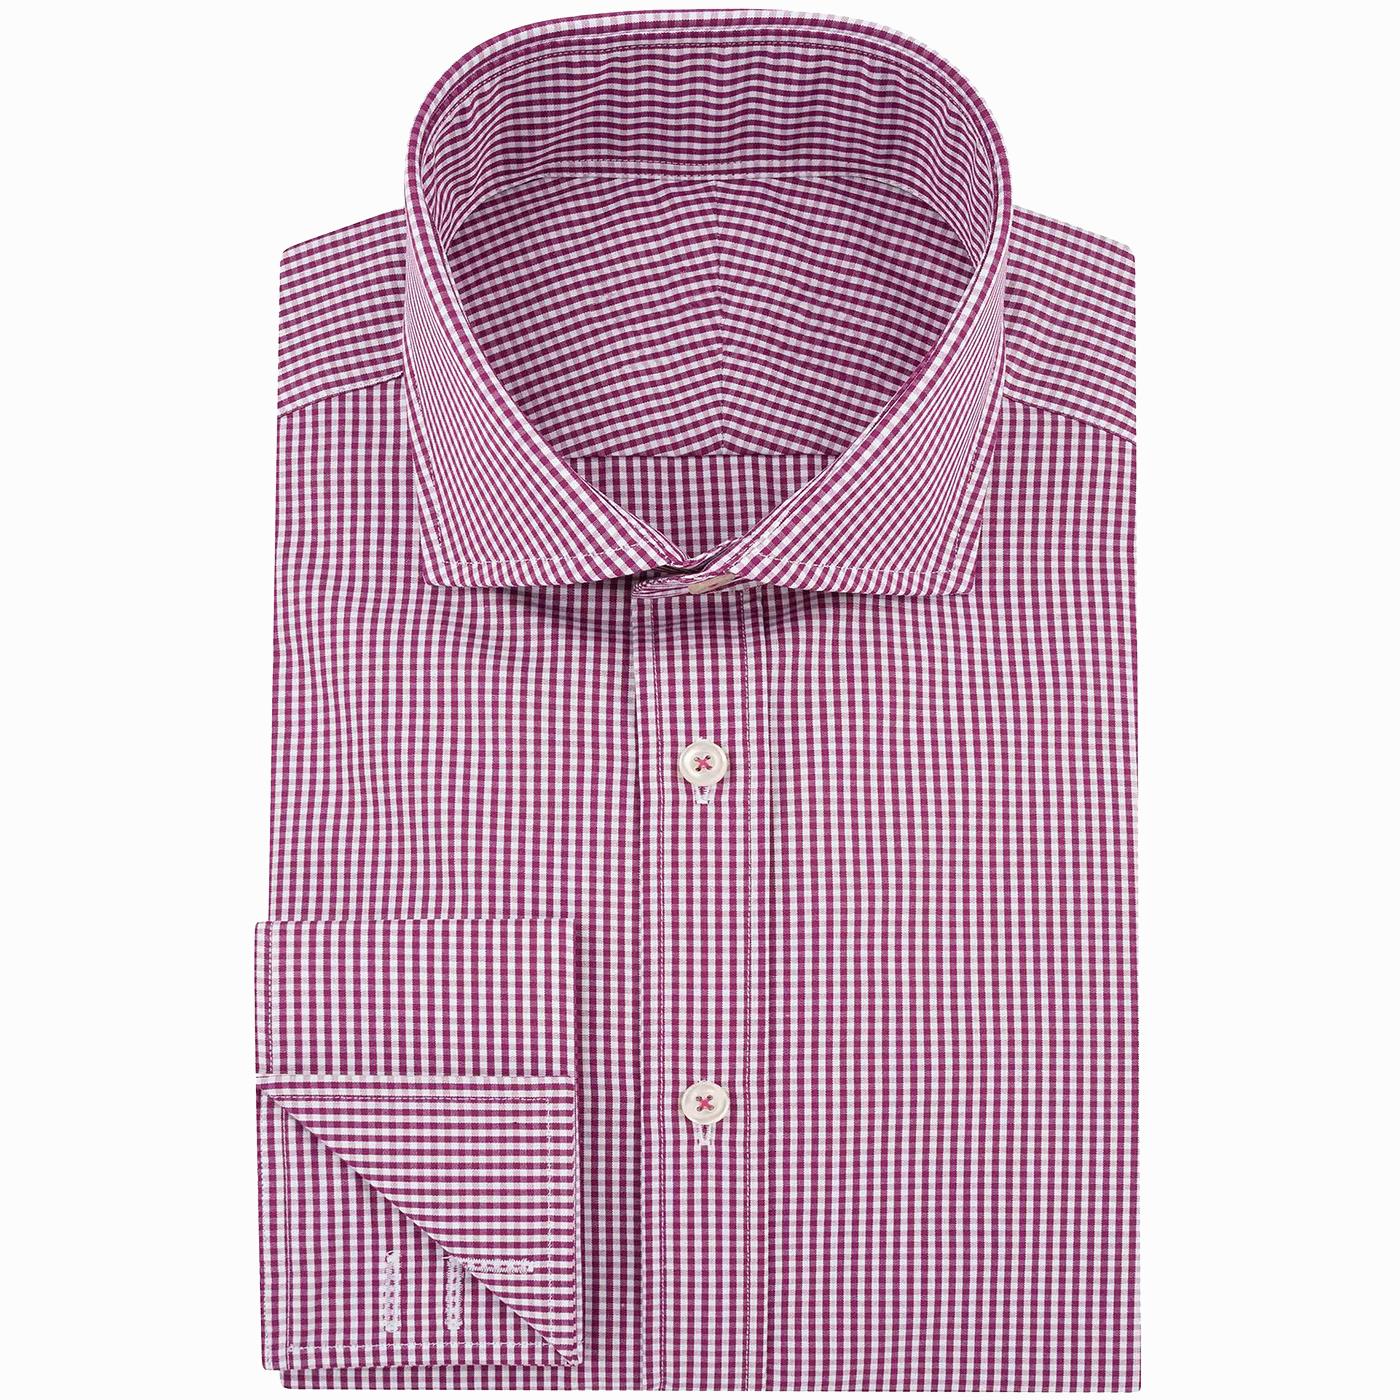 Shirt_26_Windsor-gingham_burgandy.jpg